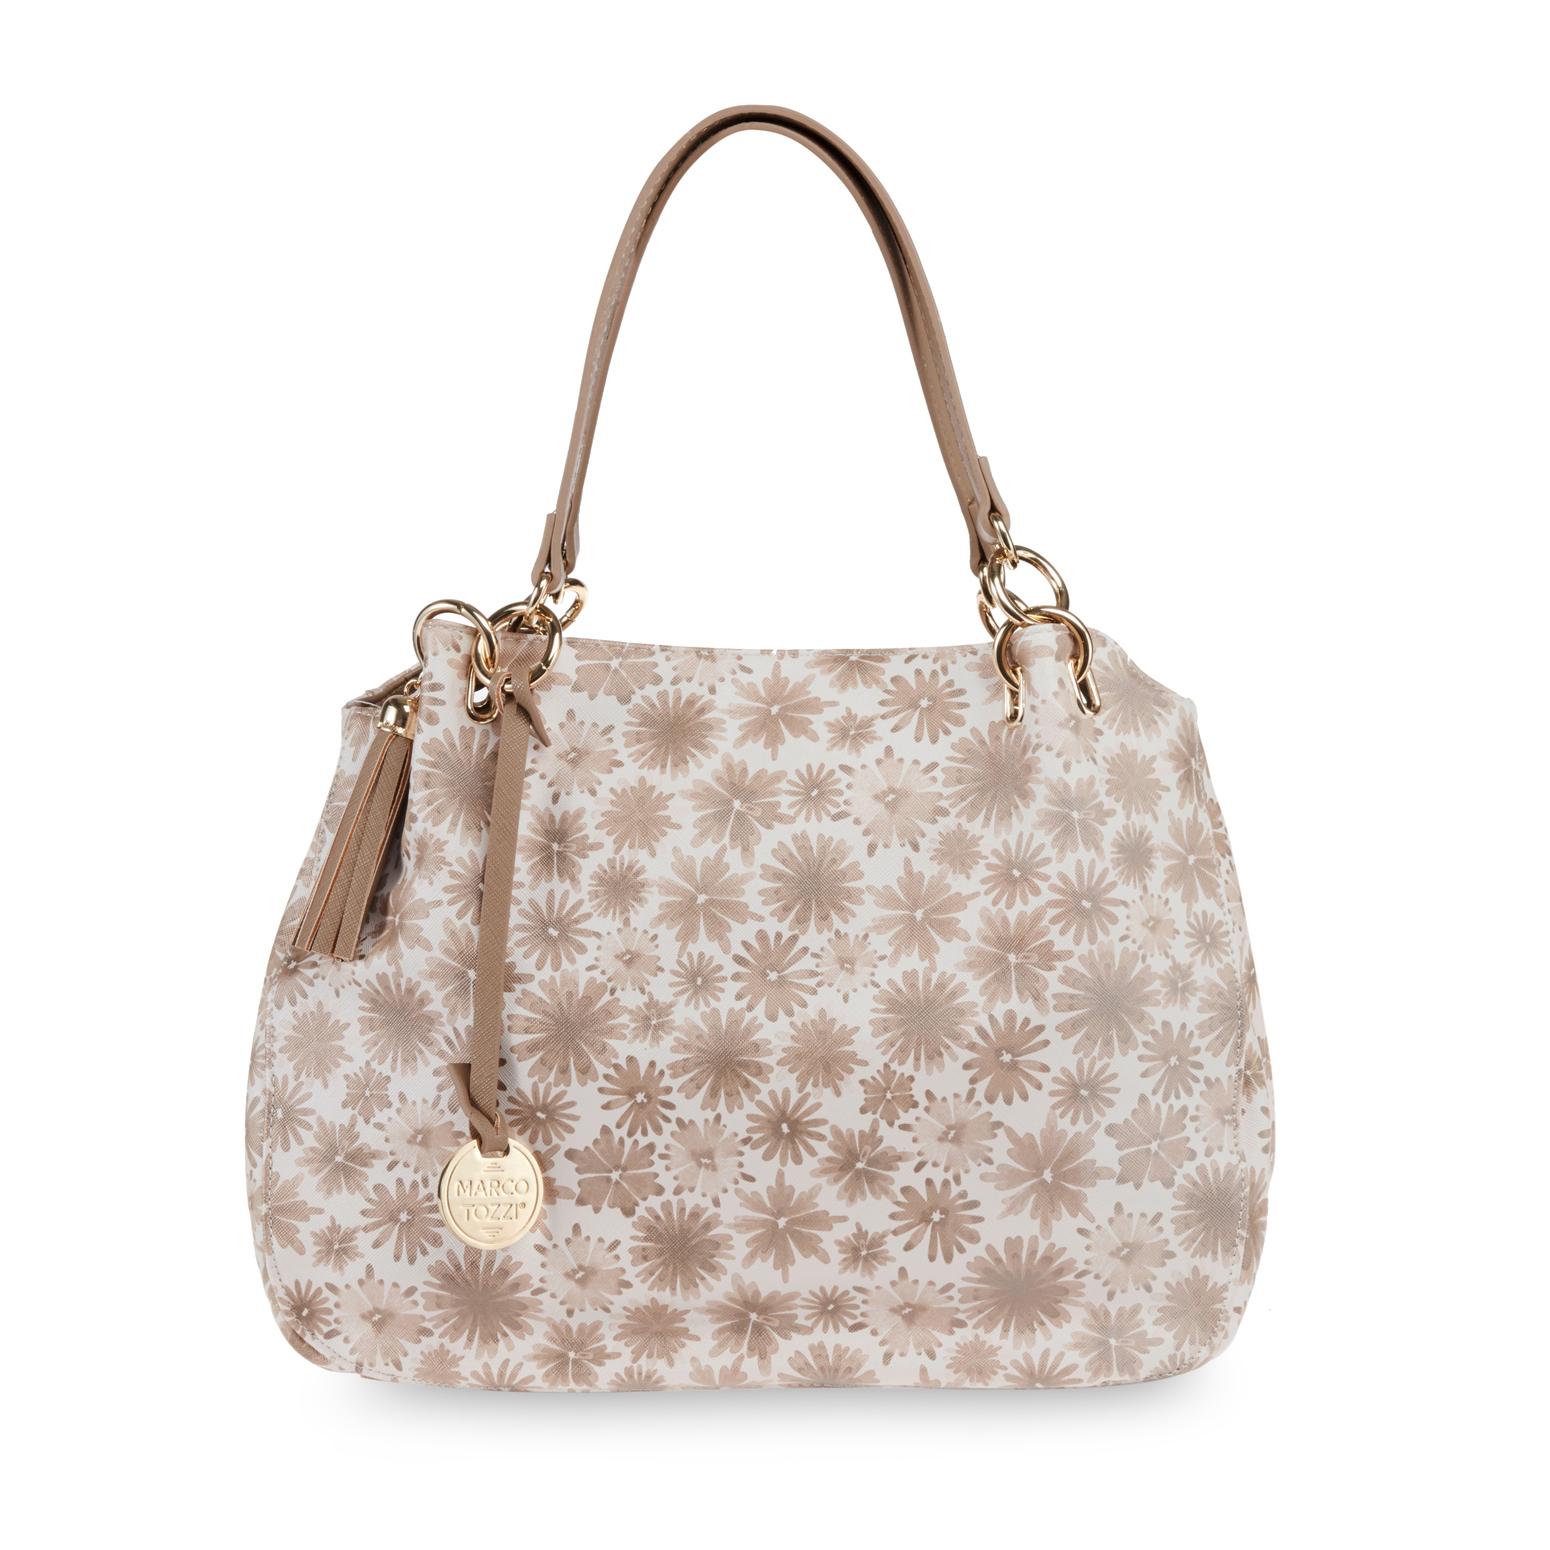 Layla 2-2-61012-28-313-1  Bags von Marco Tozzi online kaufen! d13211cf99a3